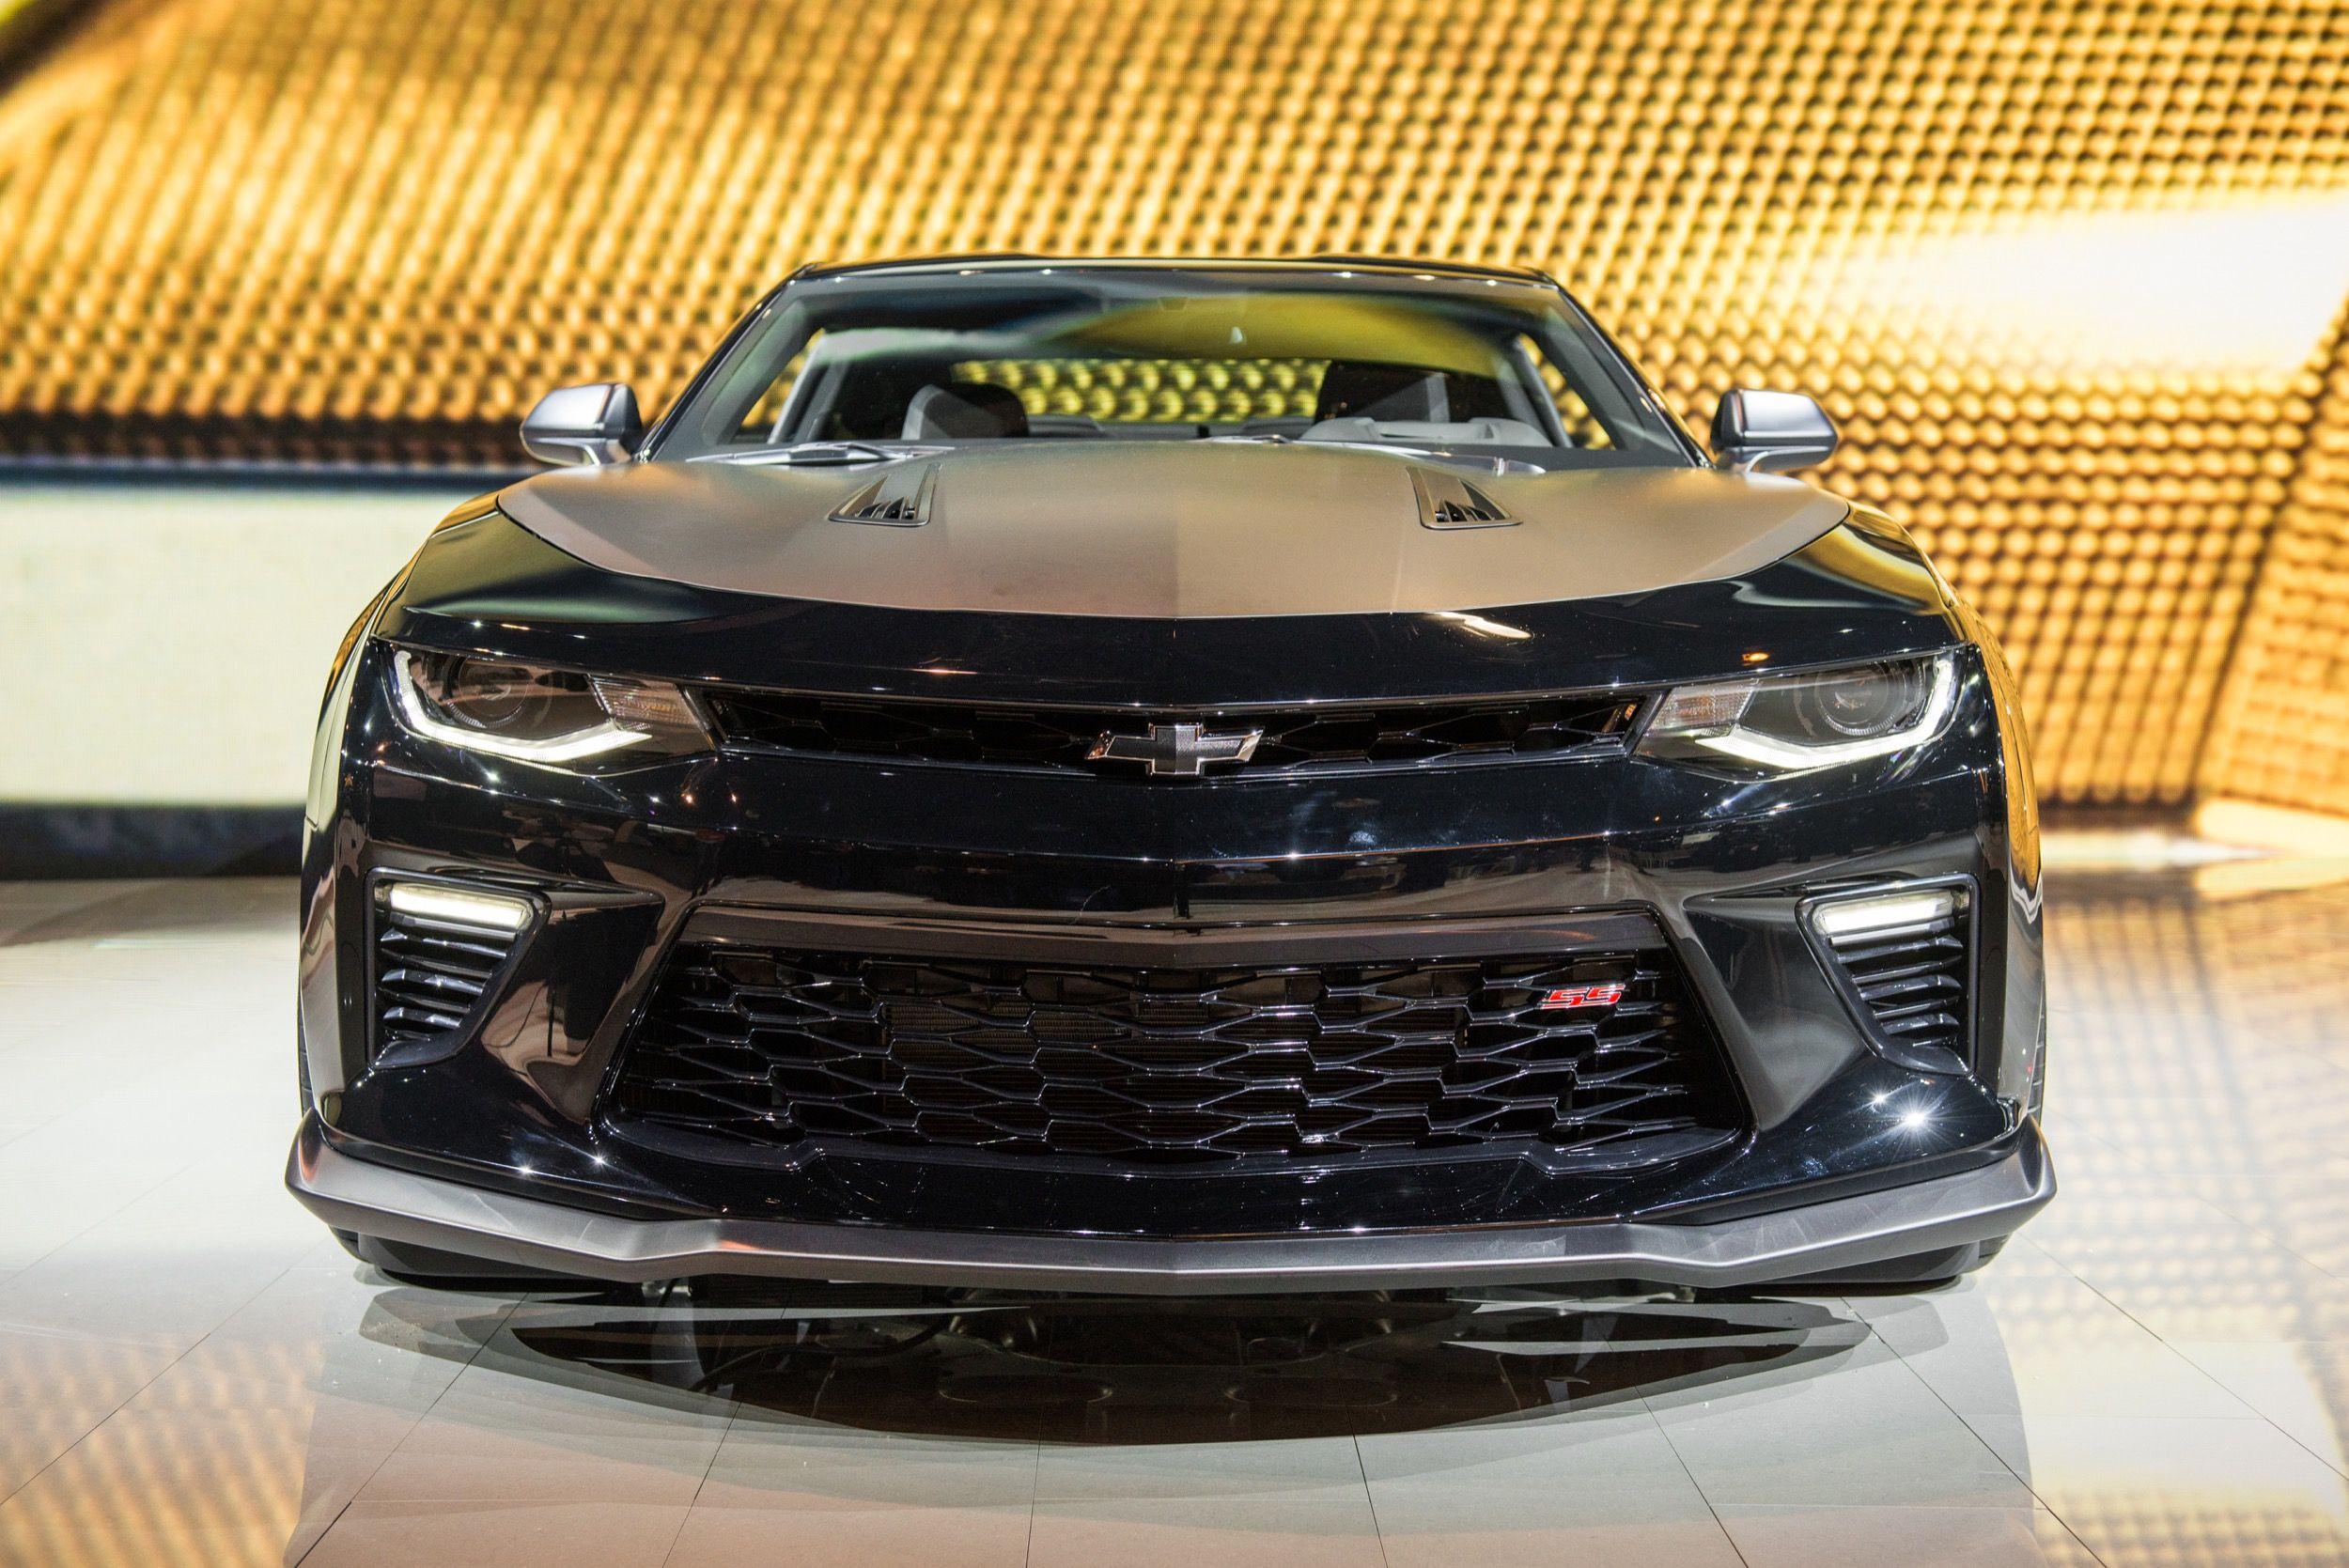 2017 chevrolet camaro ss 1le 2016 chicago auto show 003